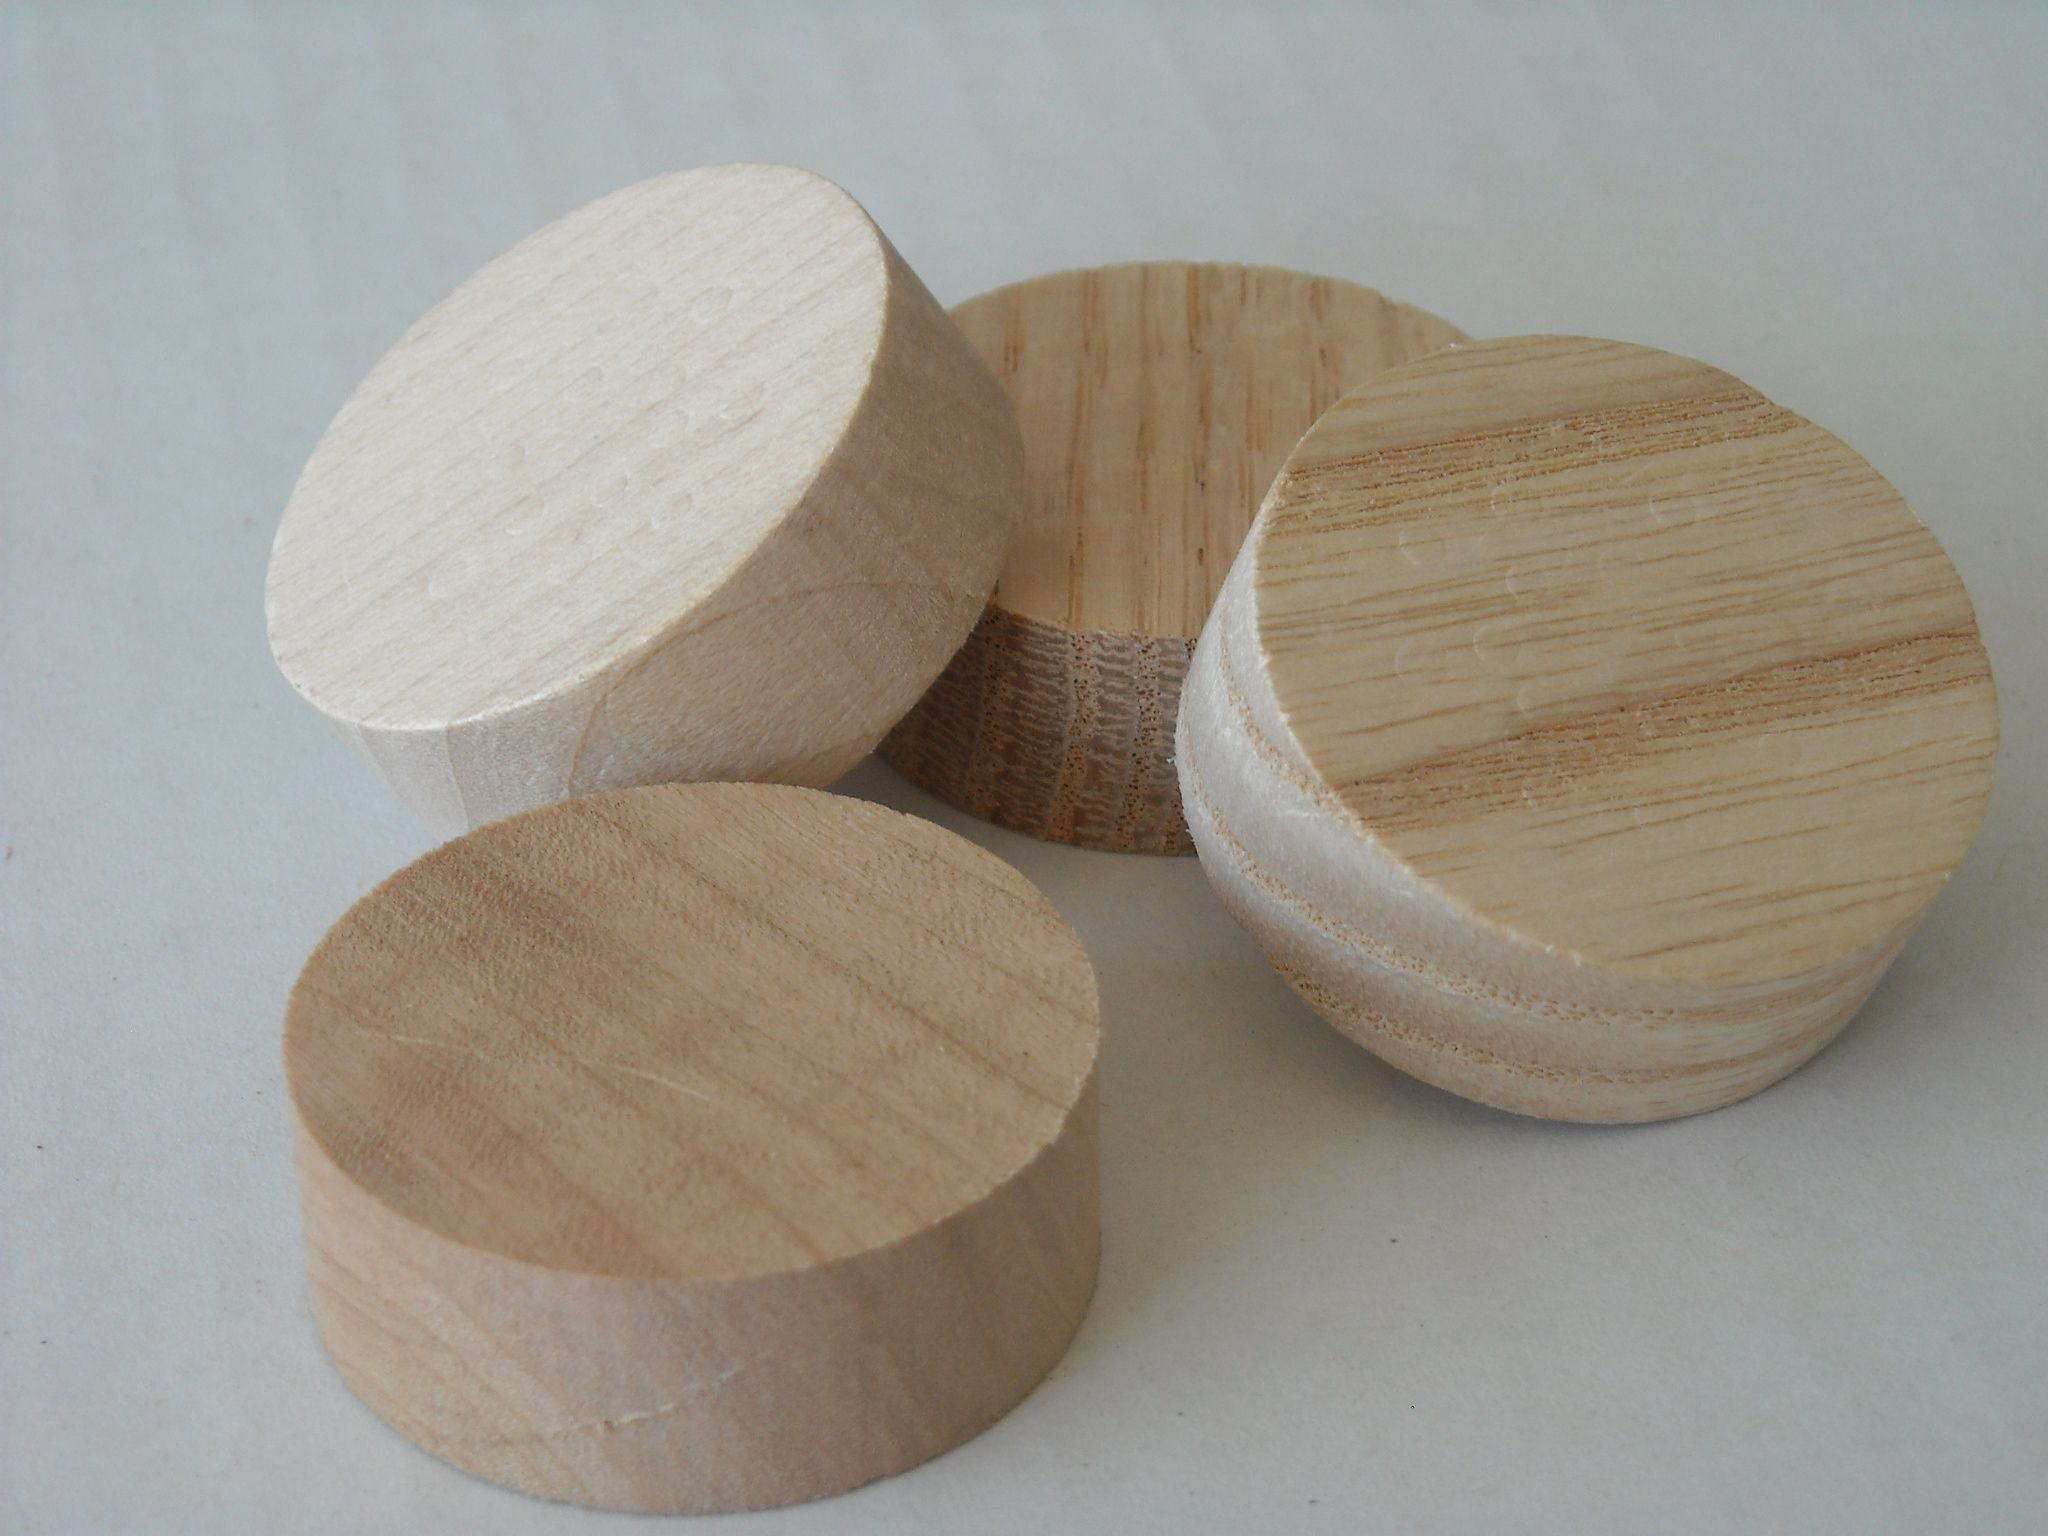 Wood Plugs & Buttons - Wooden Plugs & Buttons - Cincinnati Dowel (to ...